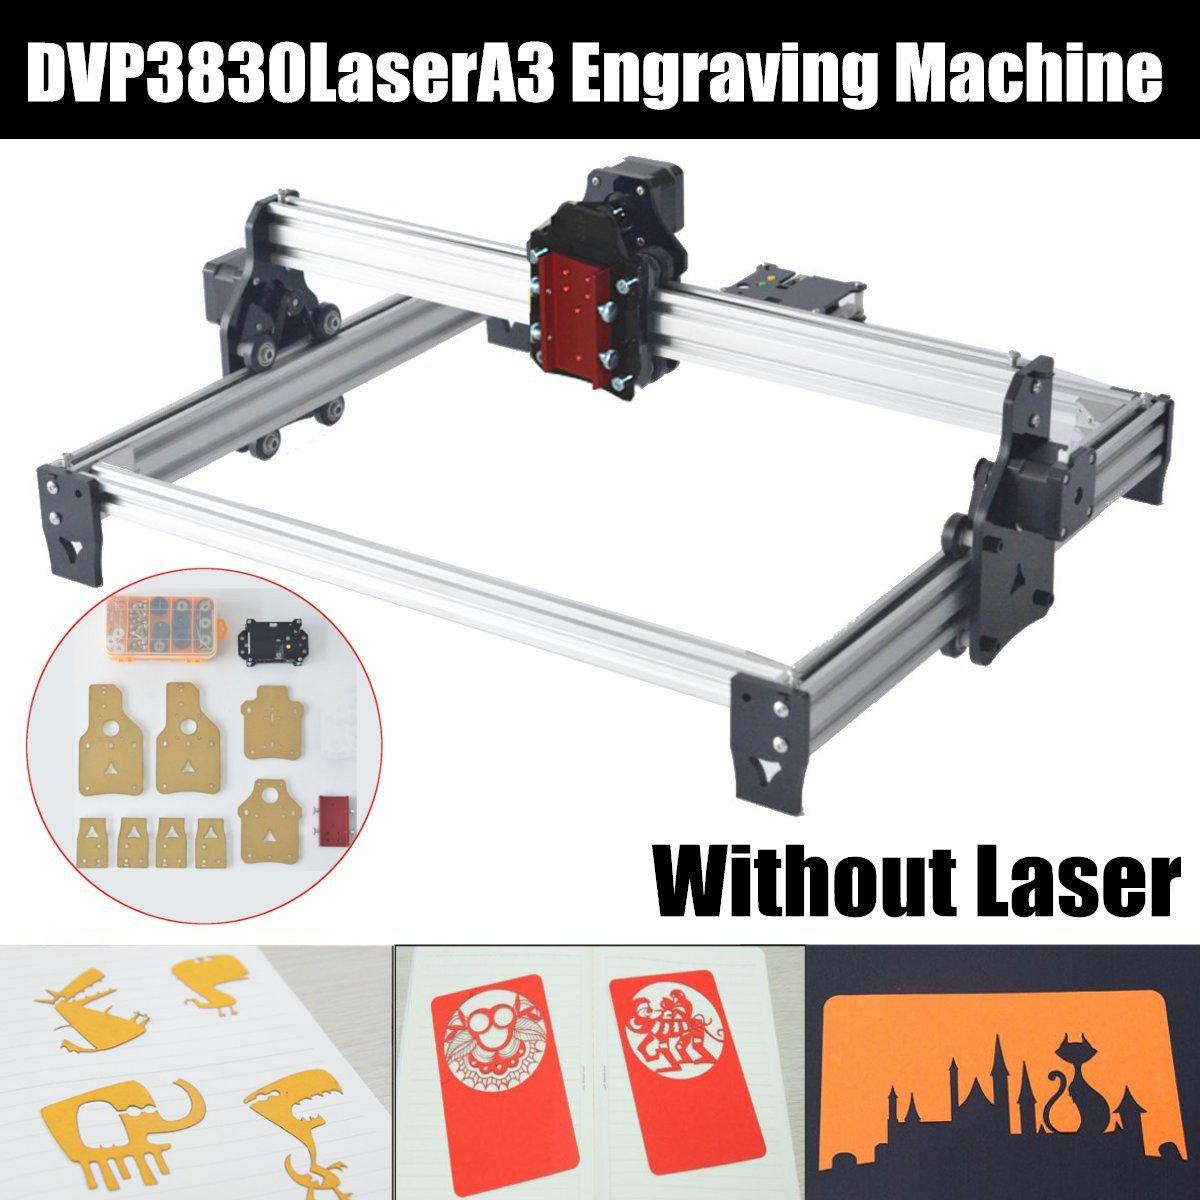 MiniUSB DVP 3830 Laser A3 Desktop USB CNC Laser Engraving Engraver Cutting Machine Without Laser Head Wooding Tools